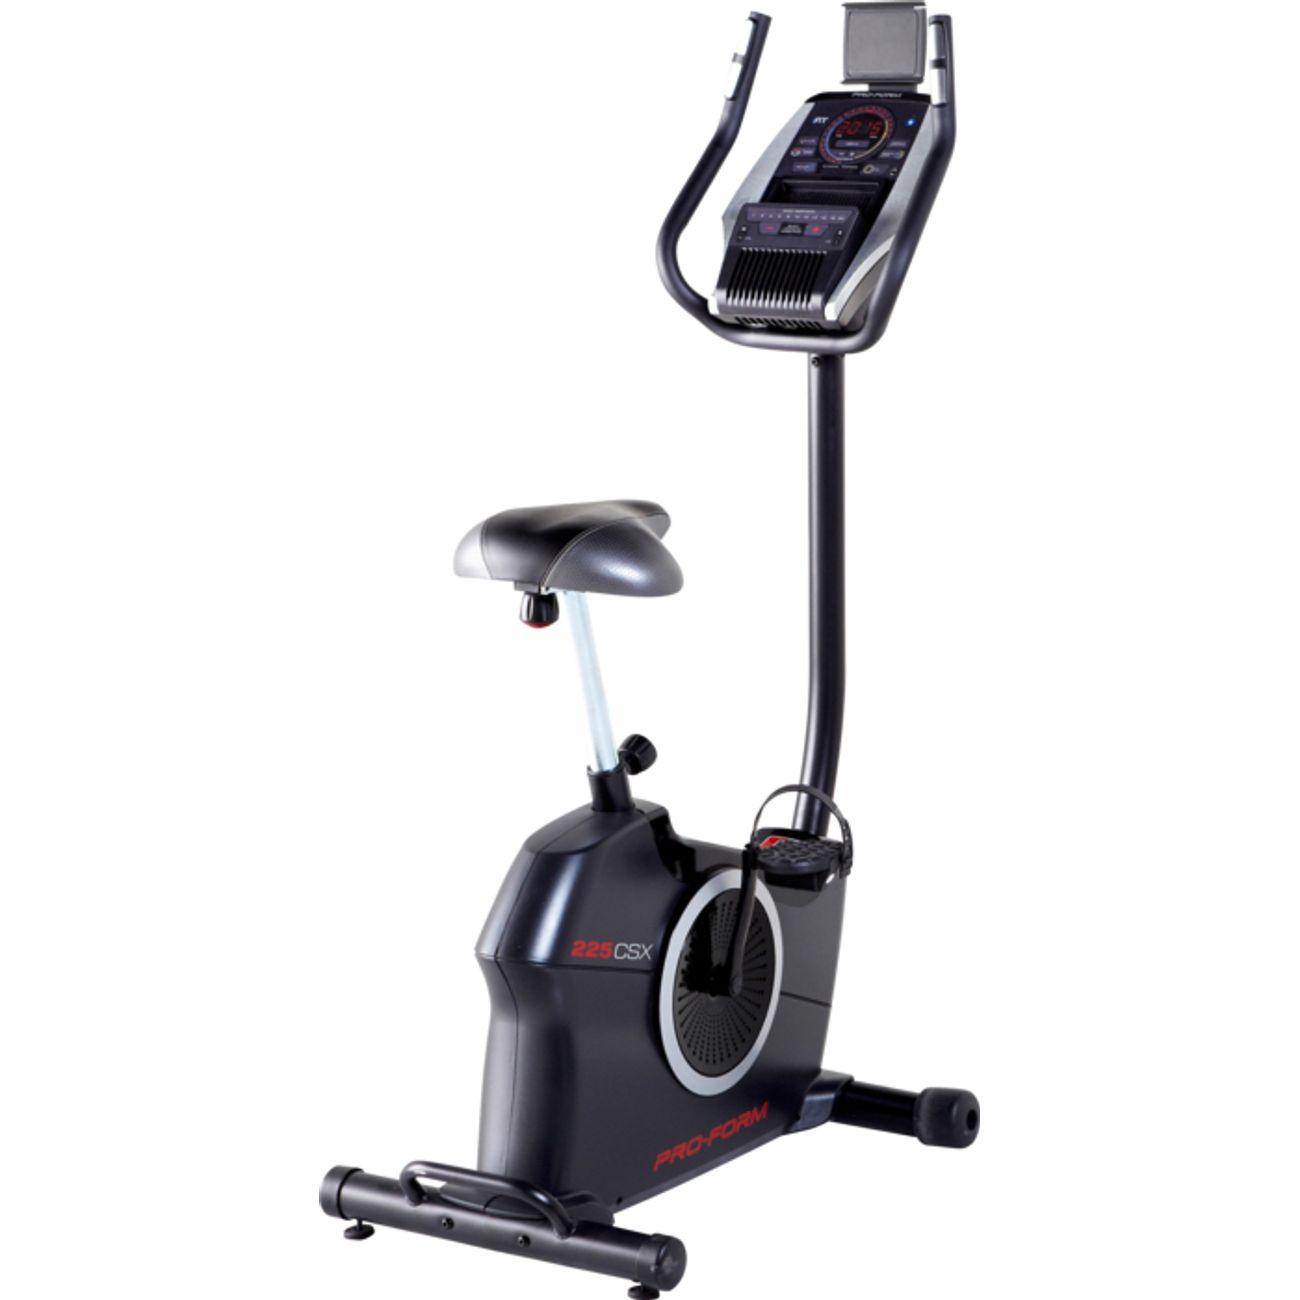 VELO D'APPARTEMENT Fitness  PROFORM 225 CSX